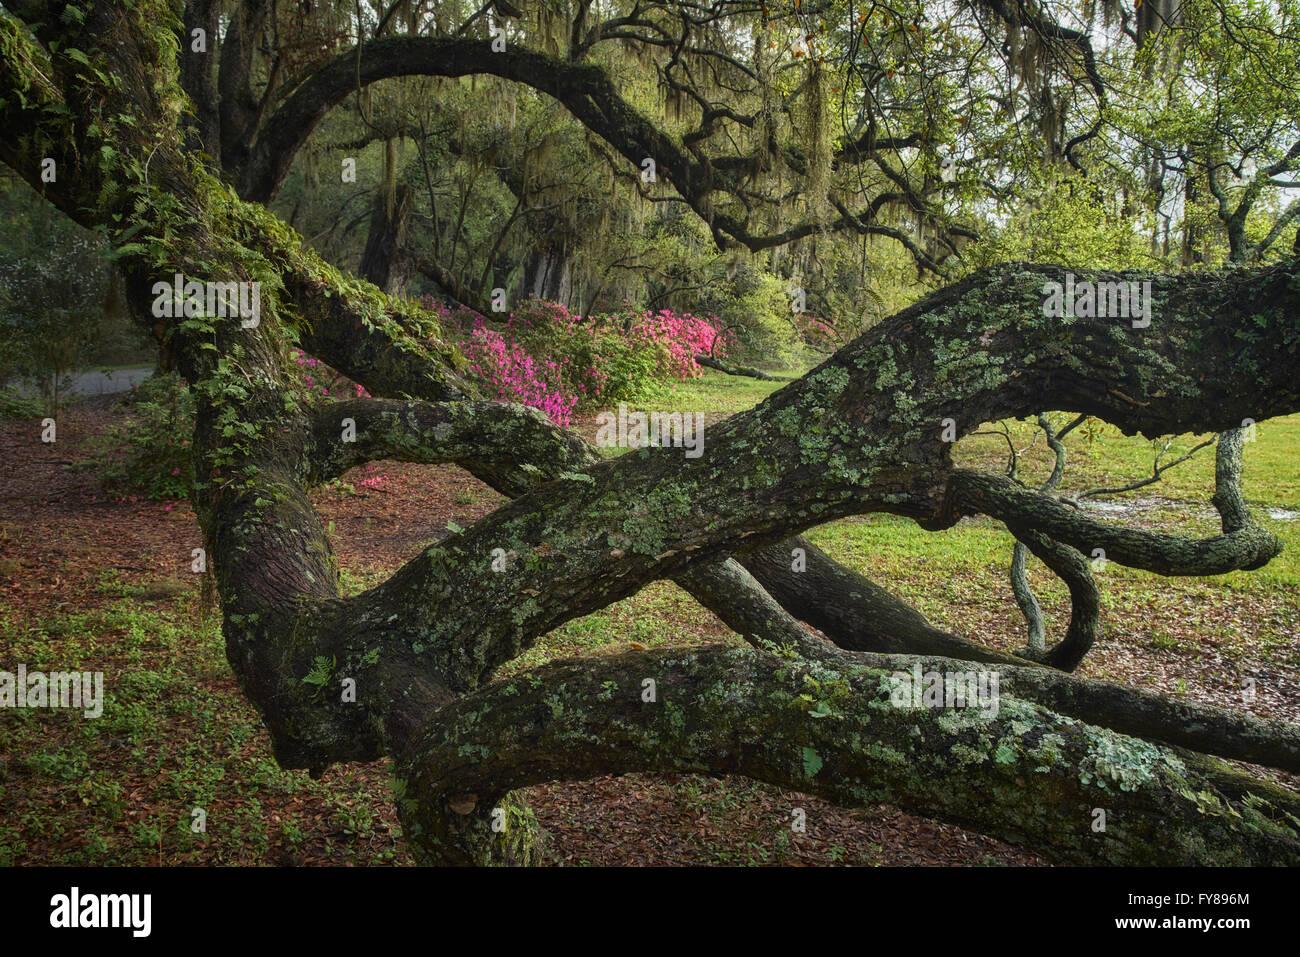 Majestic moss-covered oaks and azaleas at Magnolia Plantation and Gardens in Charleston, South Carolina - Stock Image